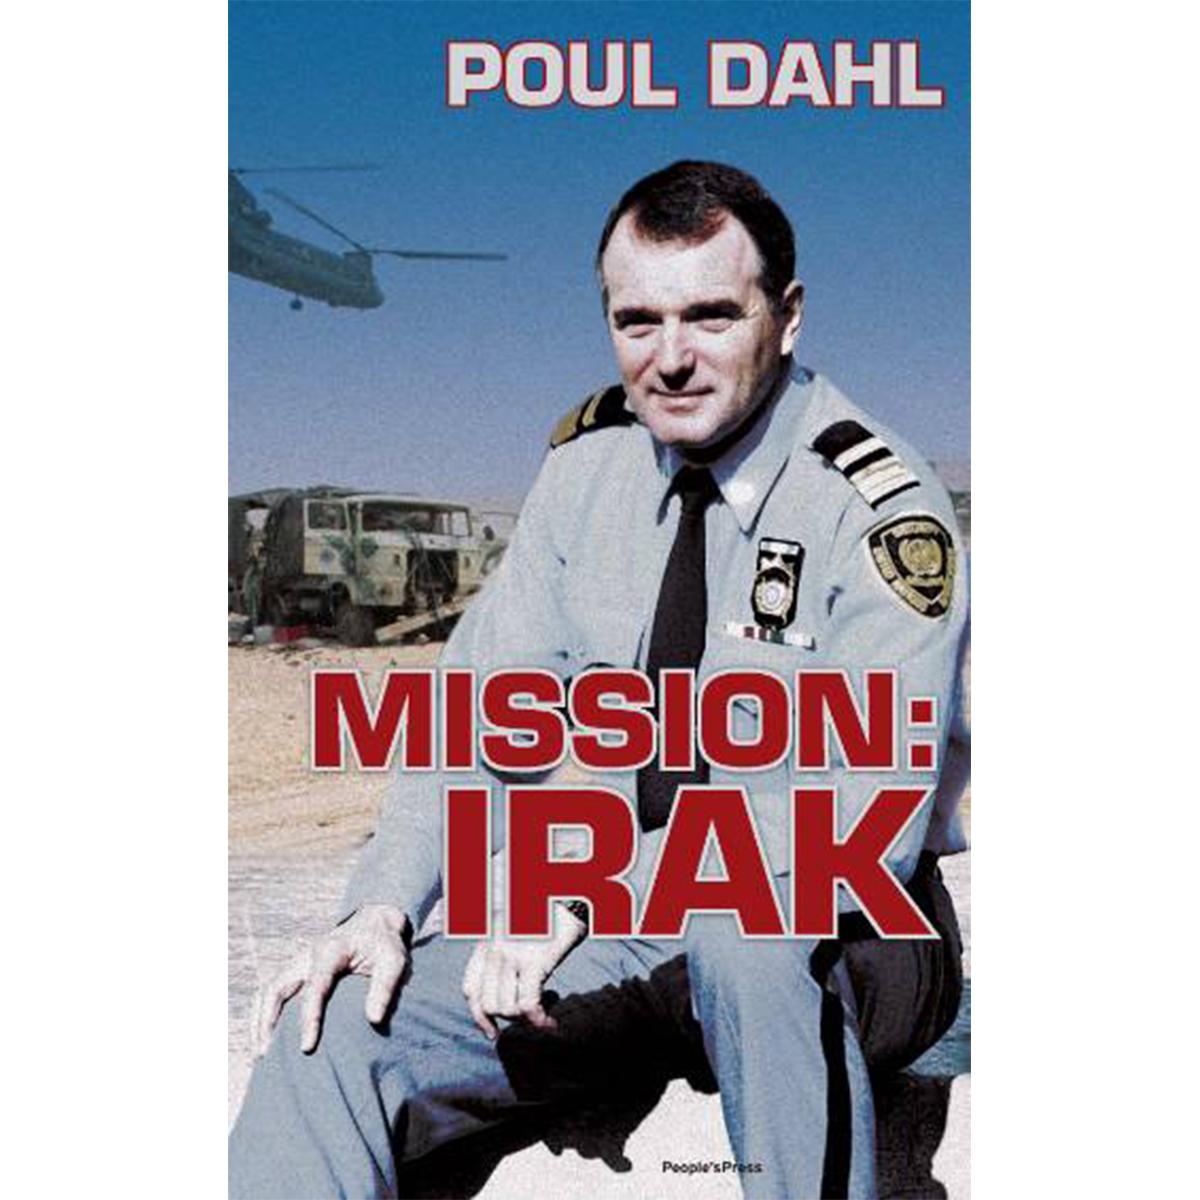 Mission Irak - Hæftet